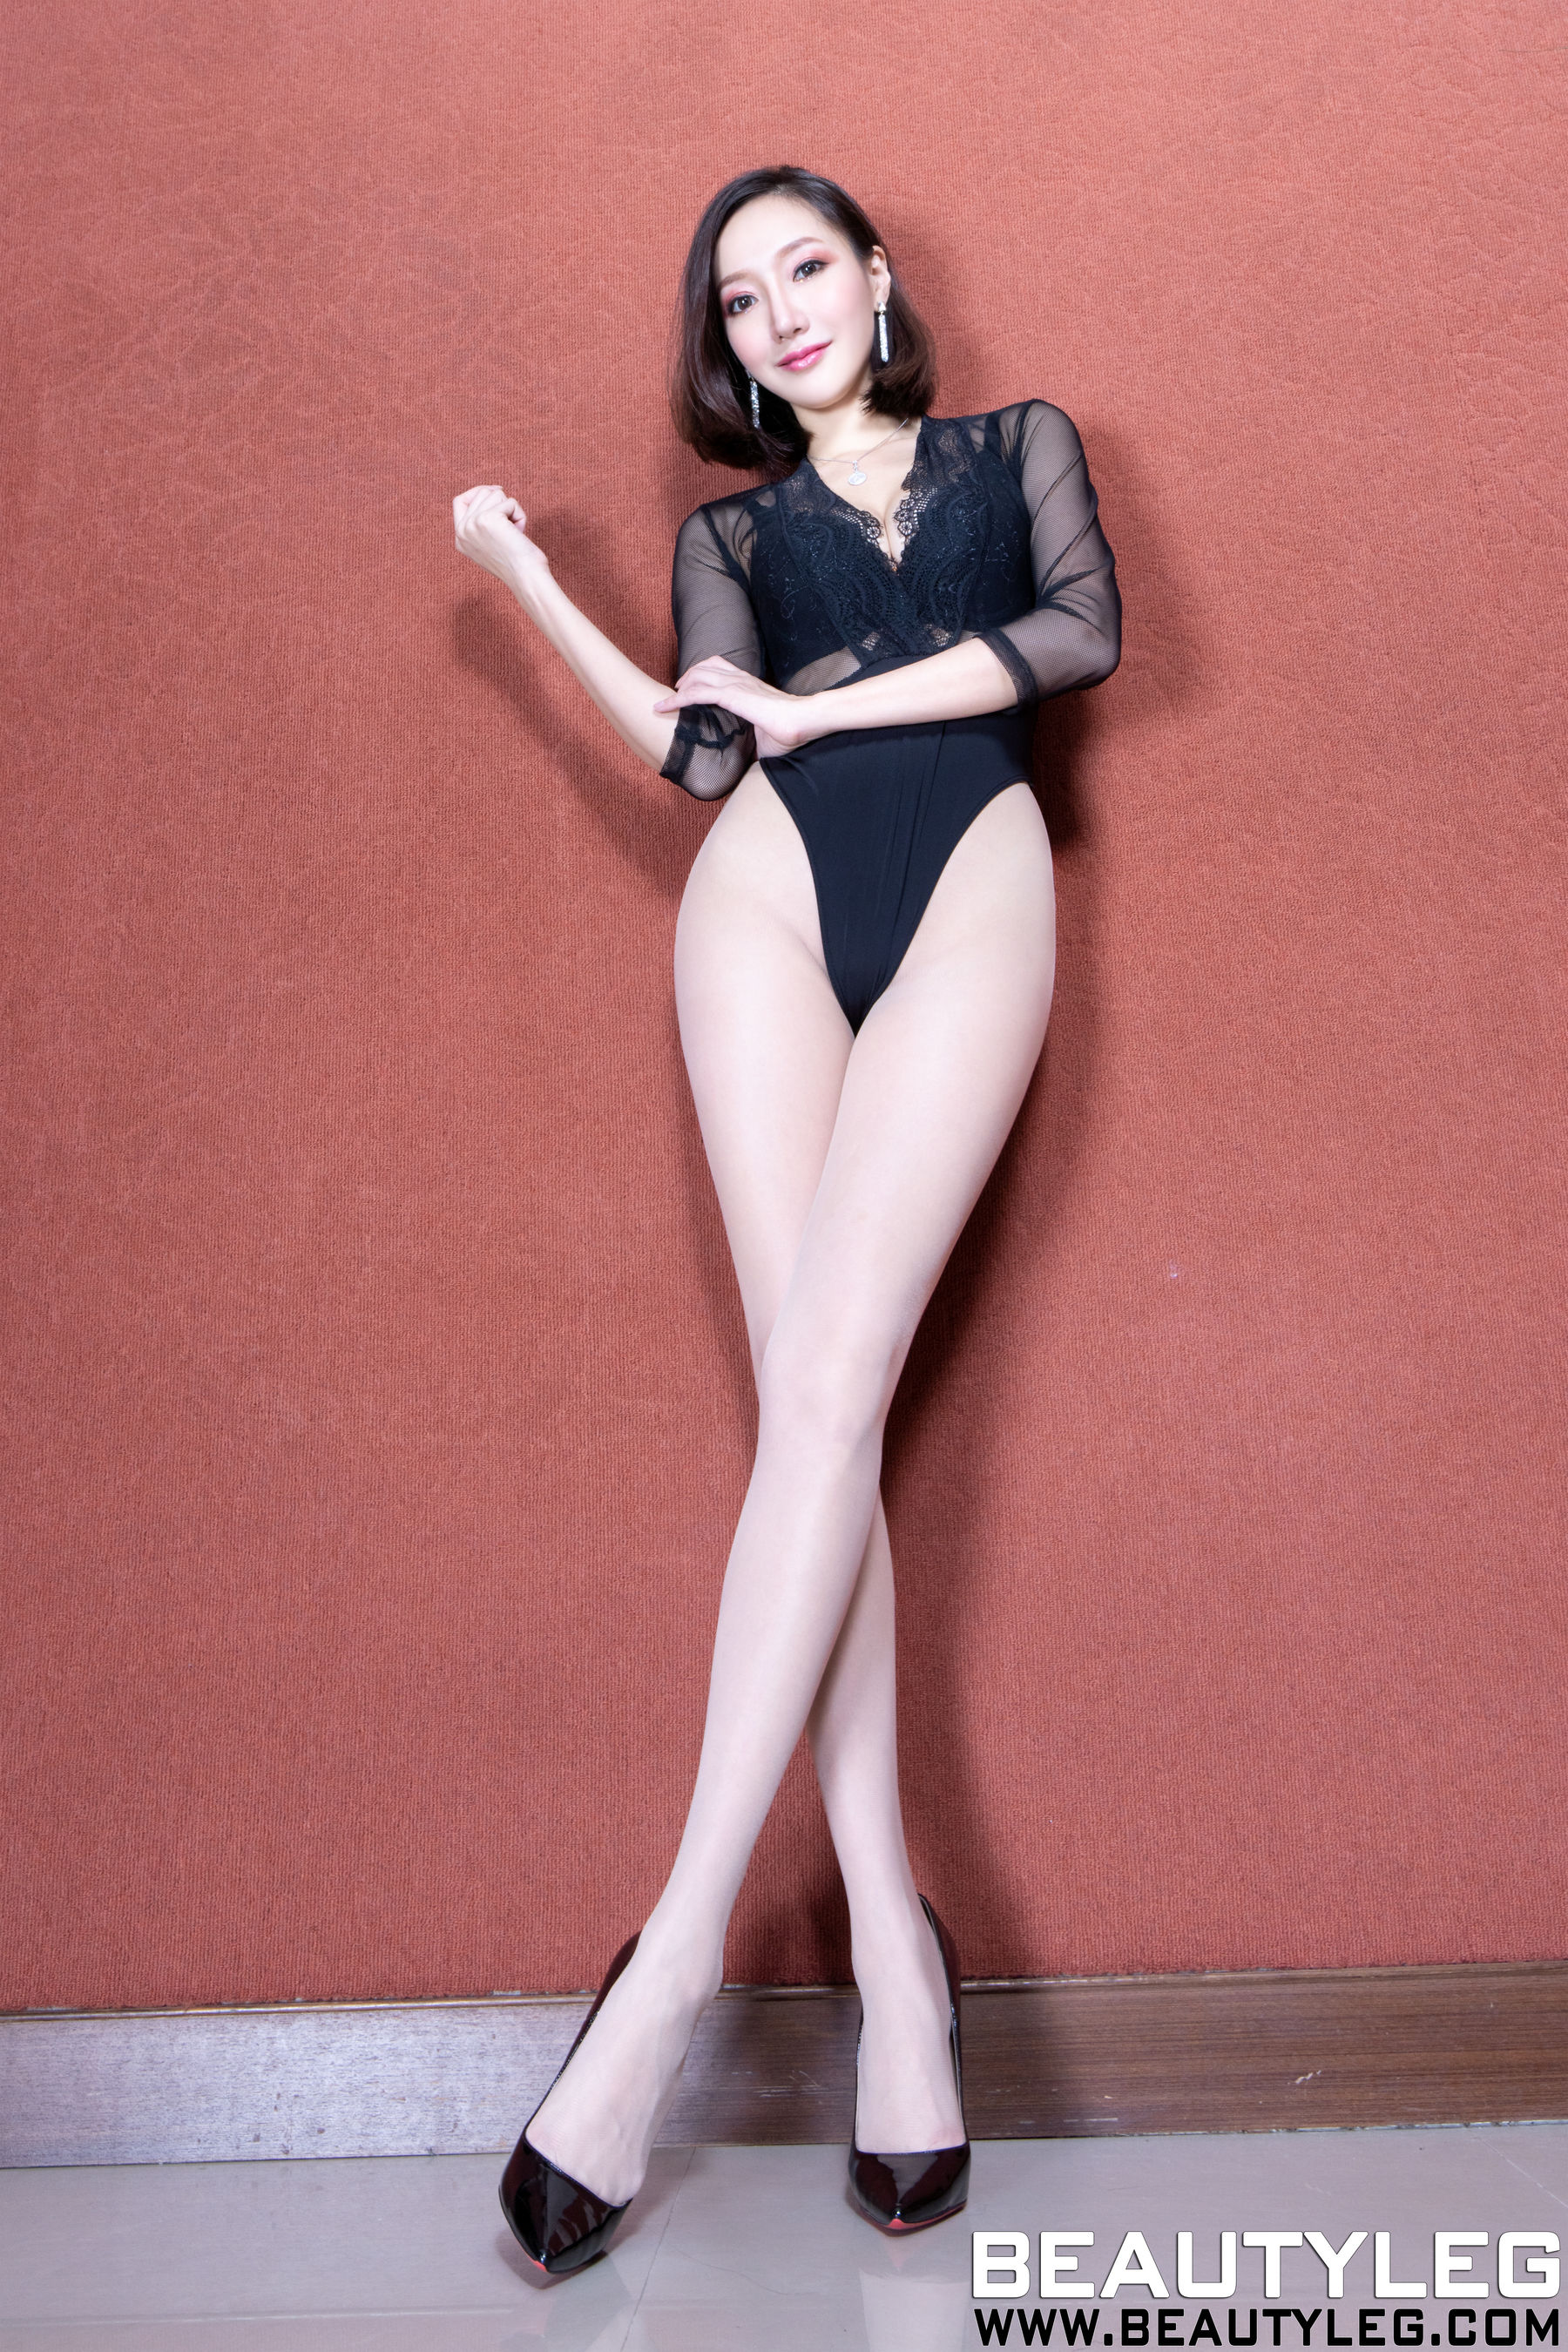 VOL.25 [Beautyleg]透视美女肉丝美腿:陈思婷(腿模Tina,李霜)超高清个人性感漂亮大图(33P)